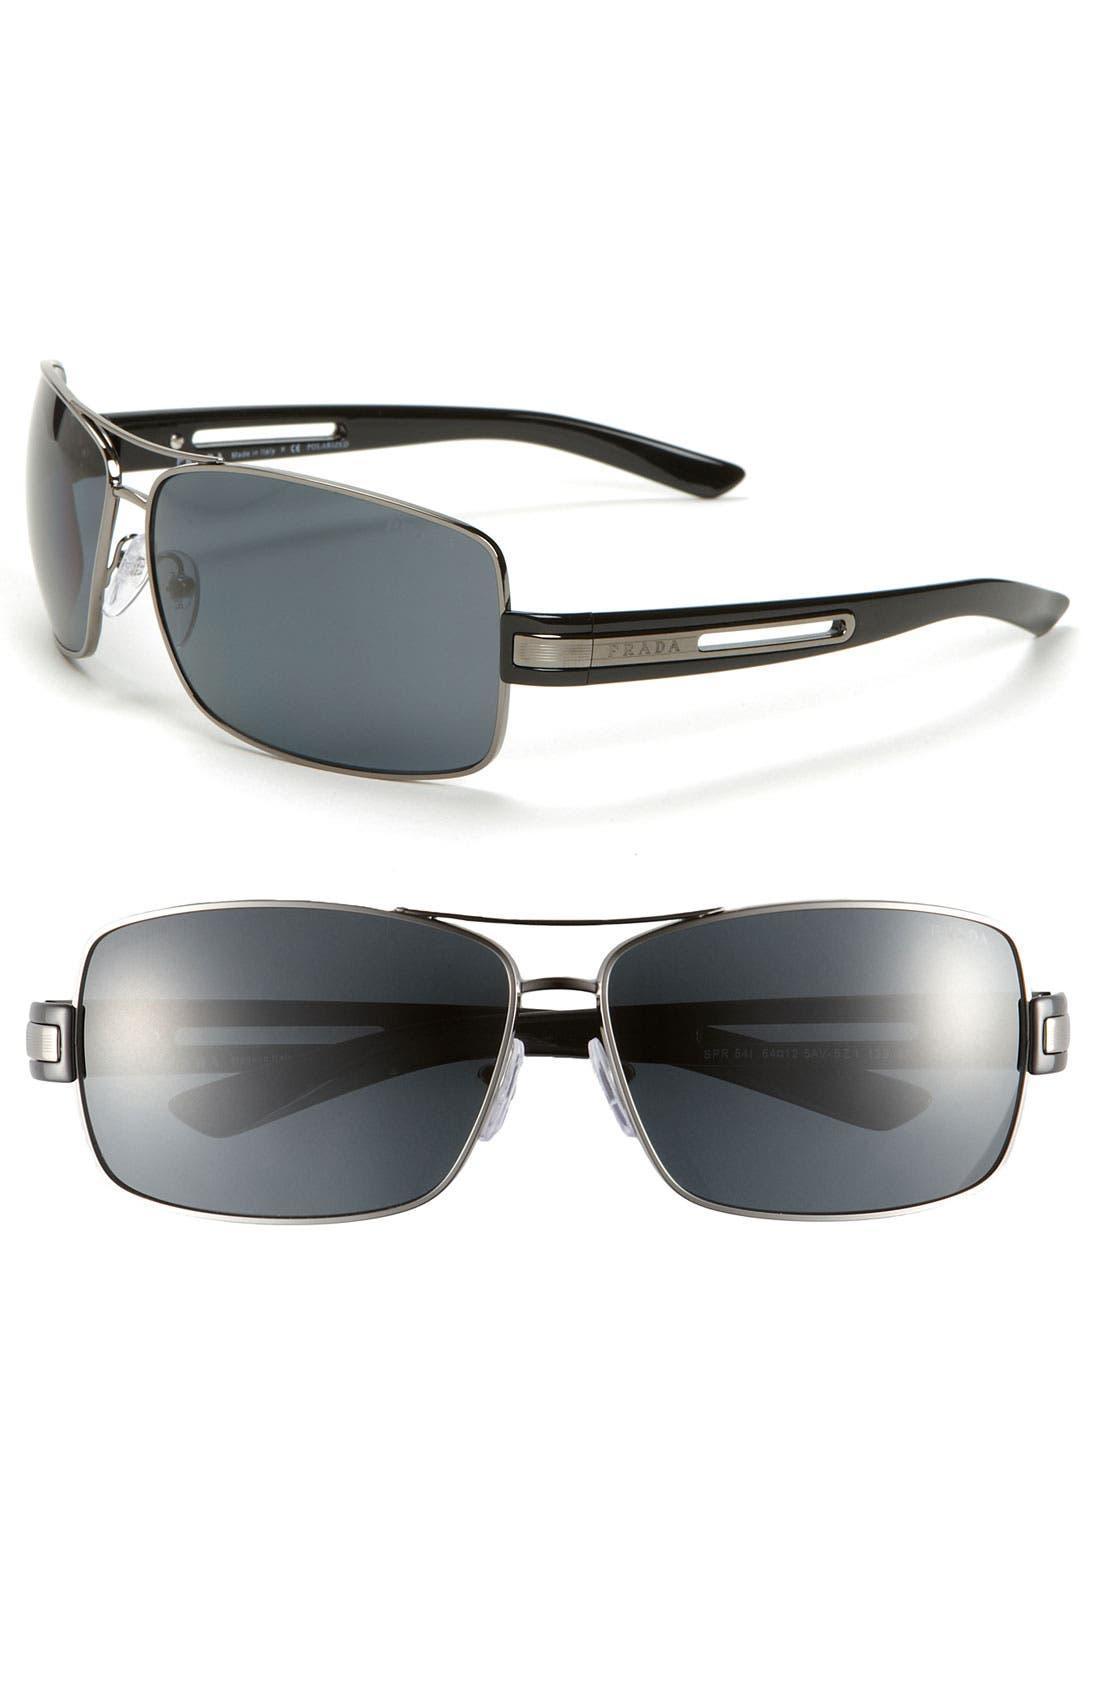 Main Image - Prada Polarized Aviator Sunglasses